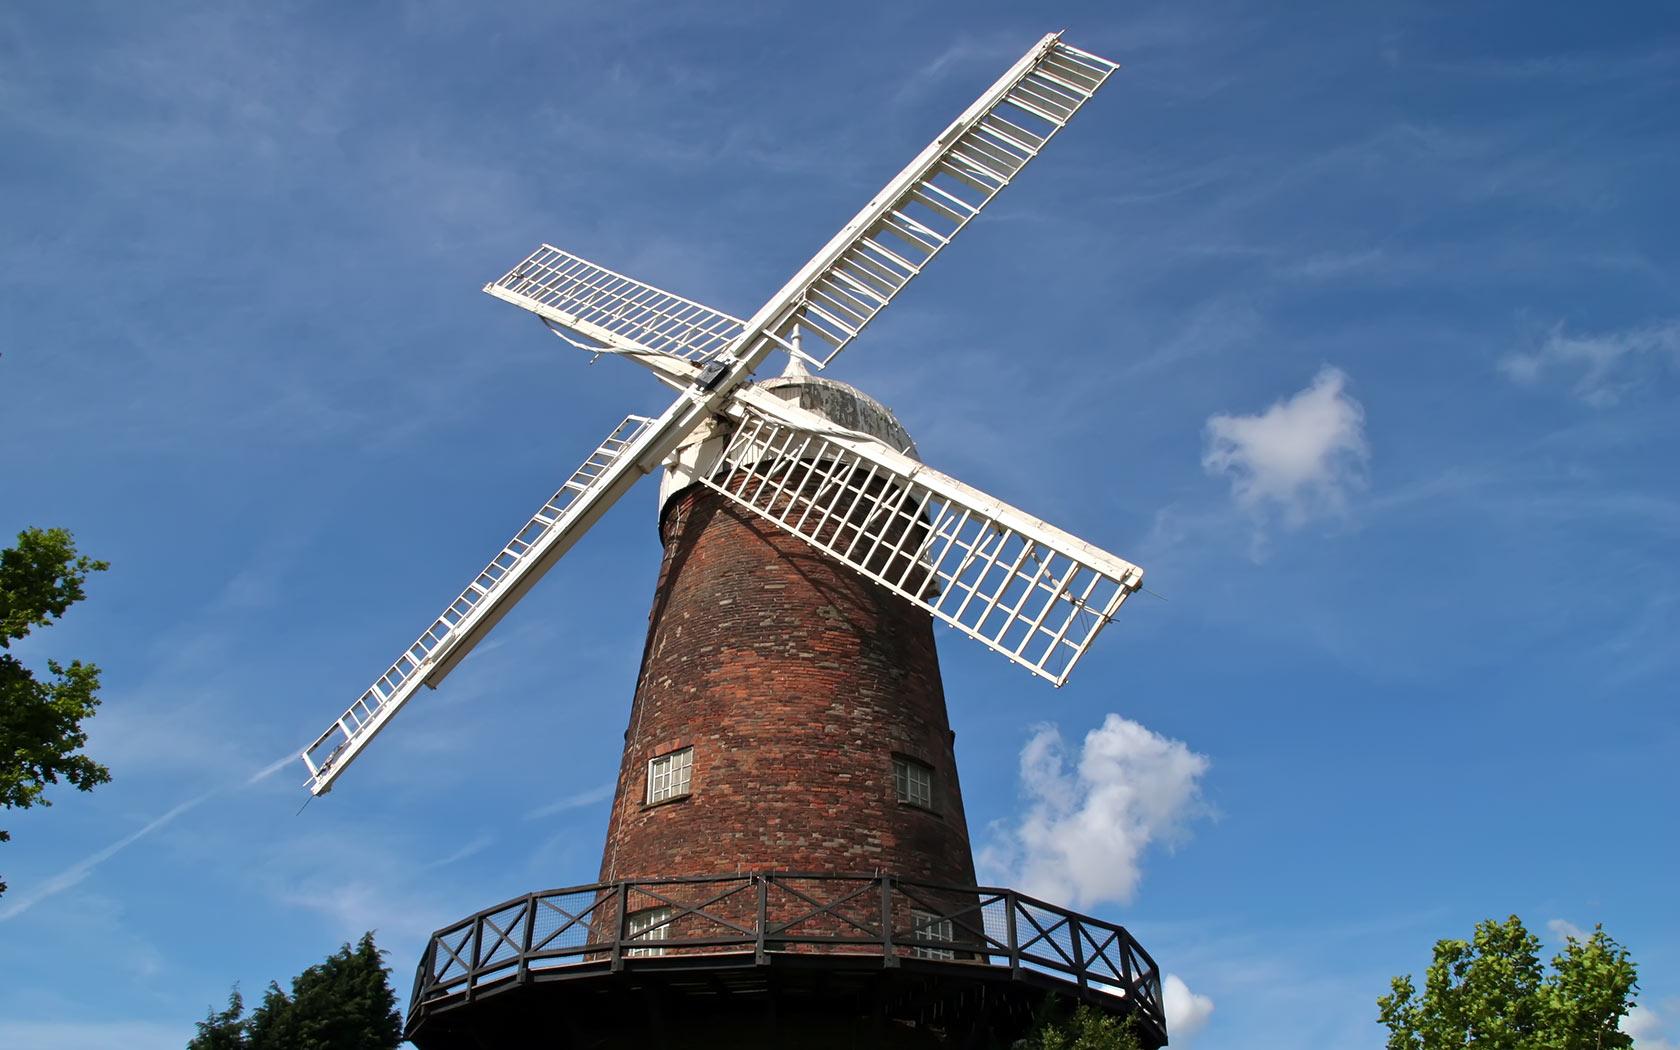 Windmills Wallpaper - WallpaperSafari